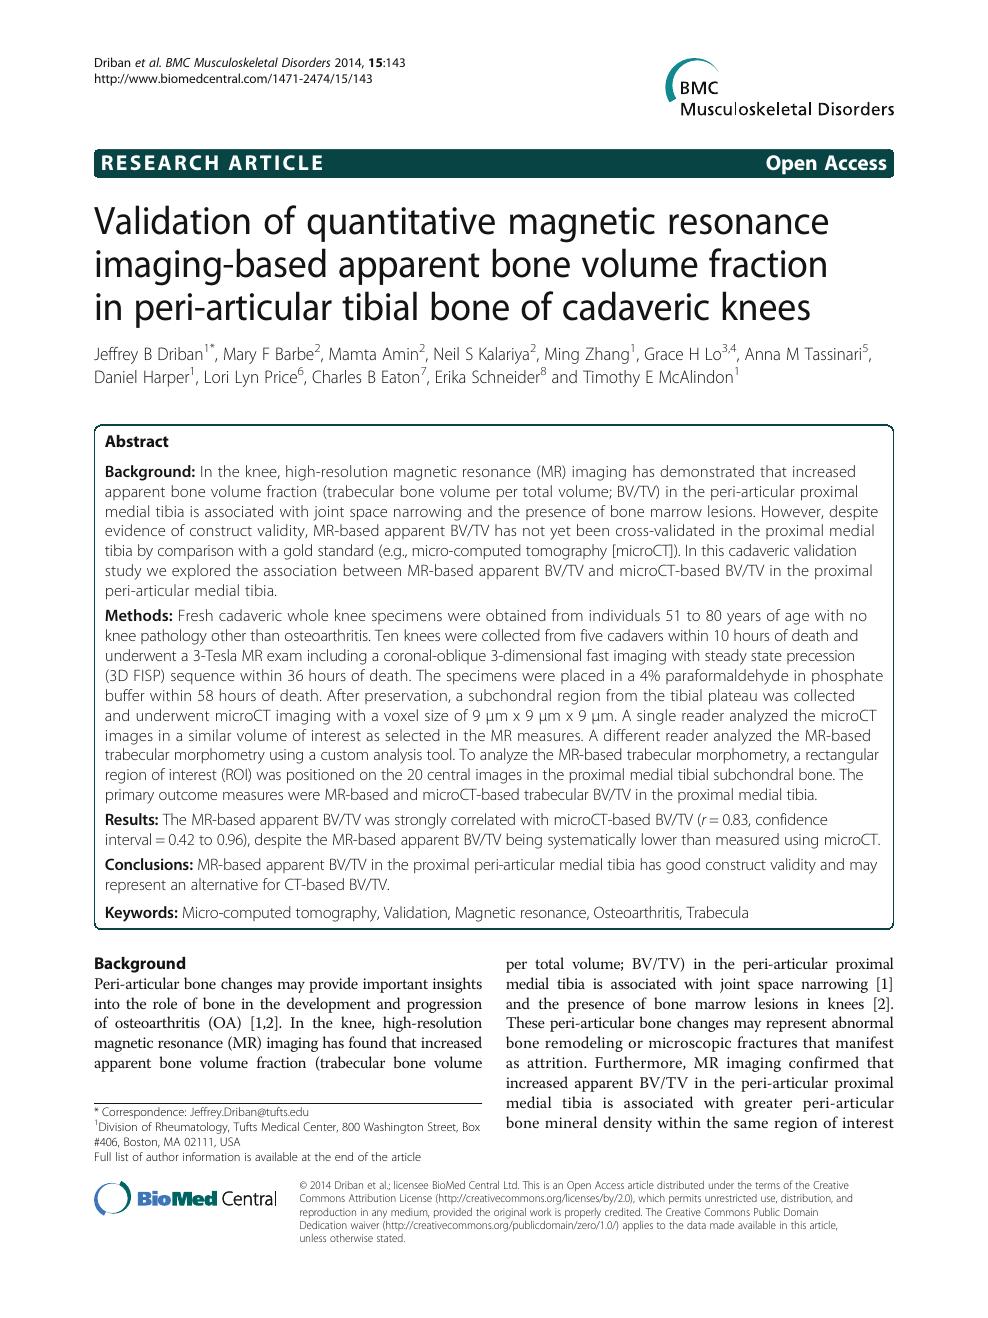 Validation Of Quantitative Magnetic Resonance Imaging-Based à Traits Obliques Ms